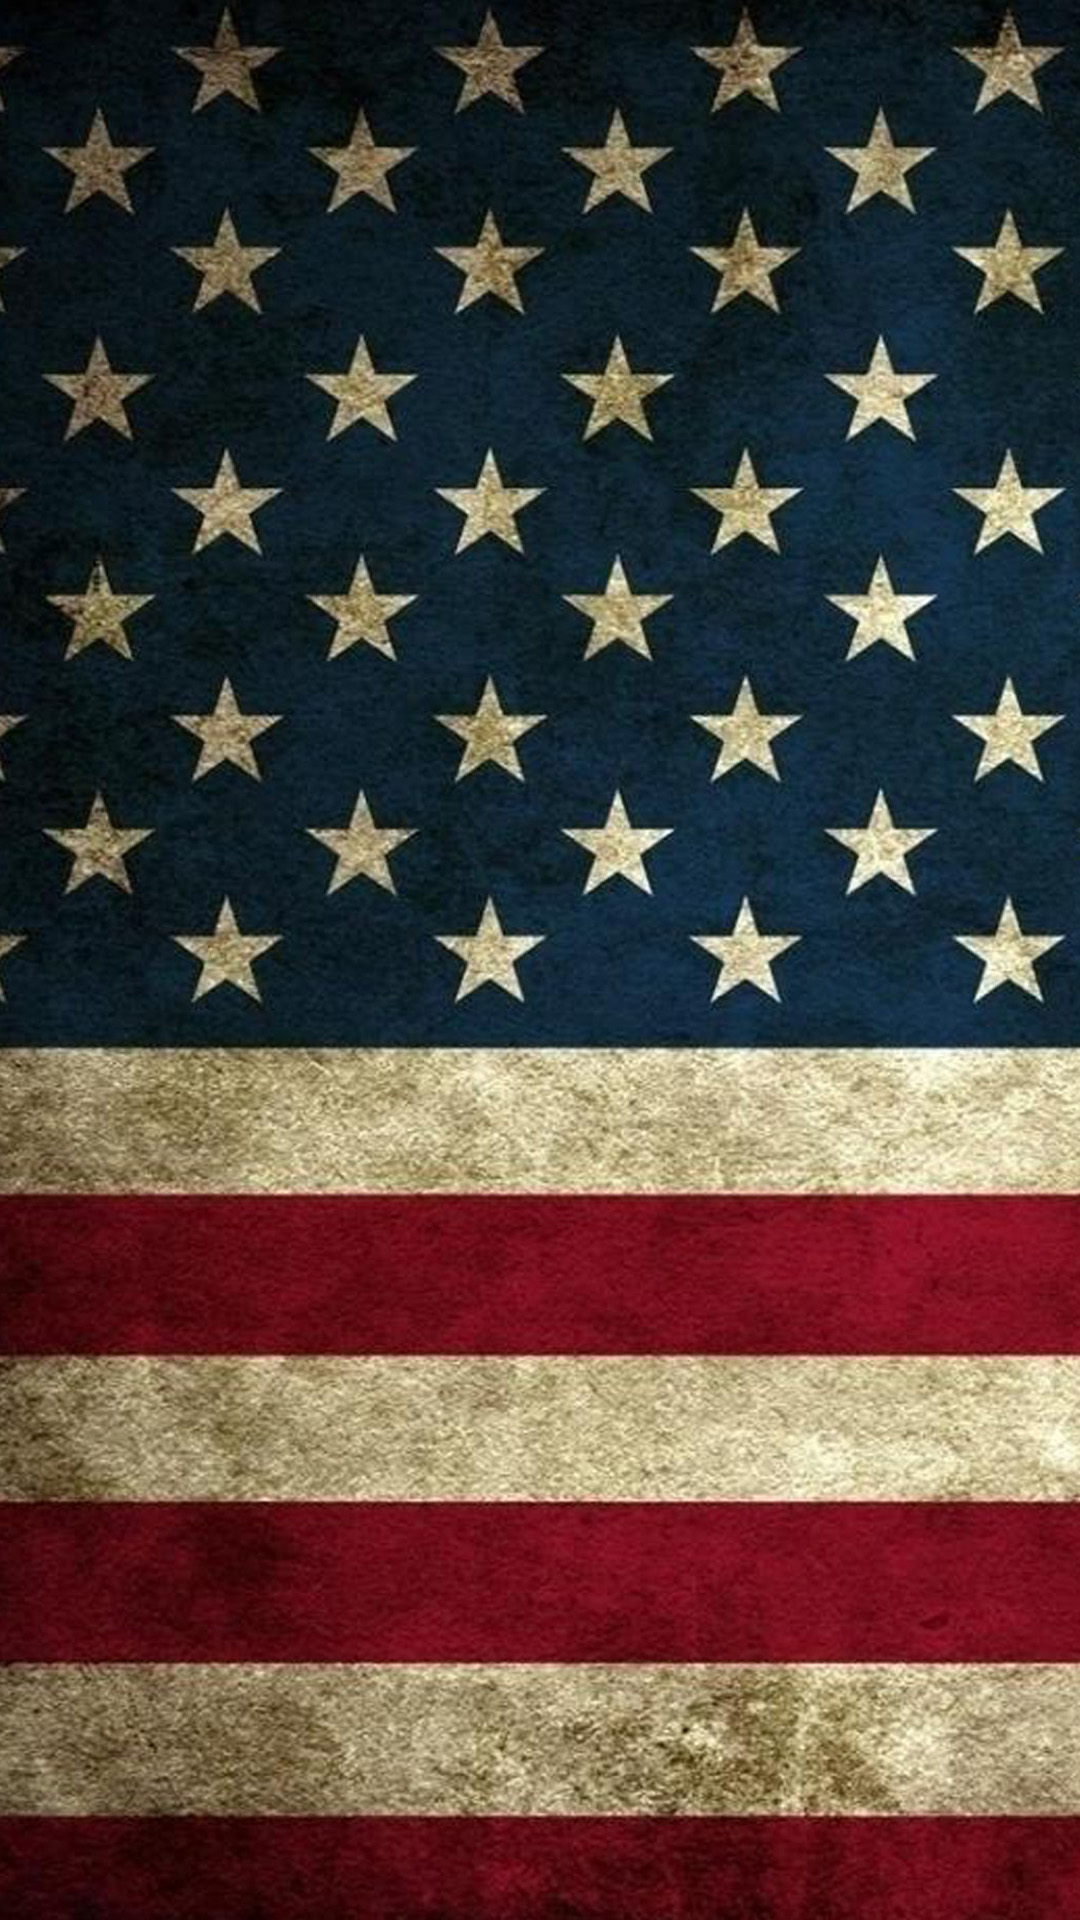 American Flag Samsung Wallpapers Samsung Galaxy S5 Galaxy S4 Galaxy 1080x1920